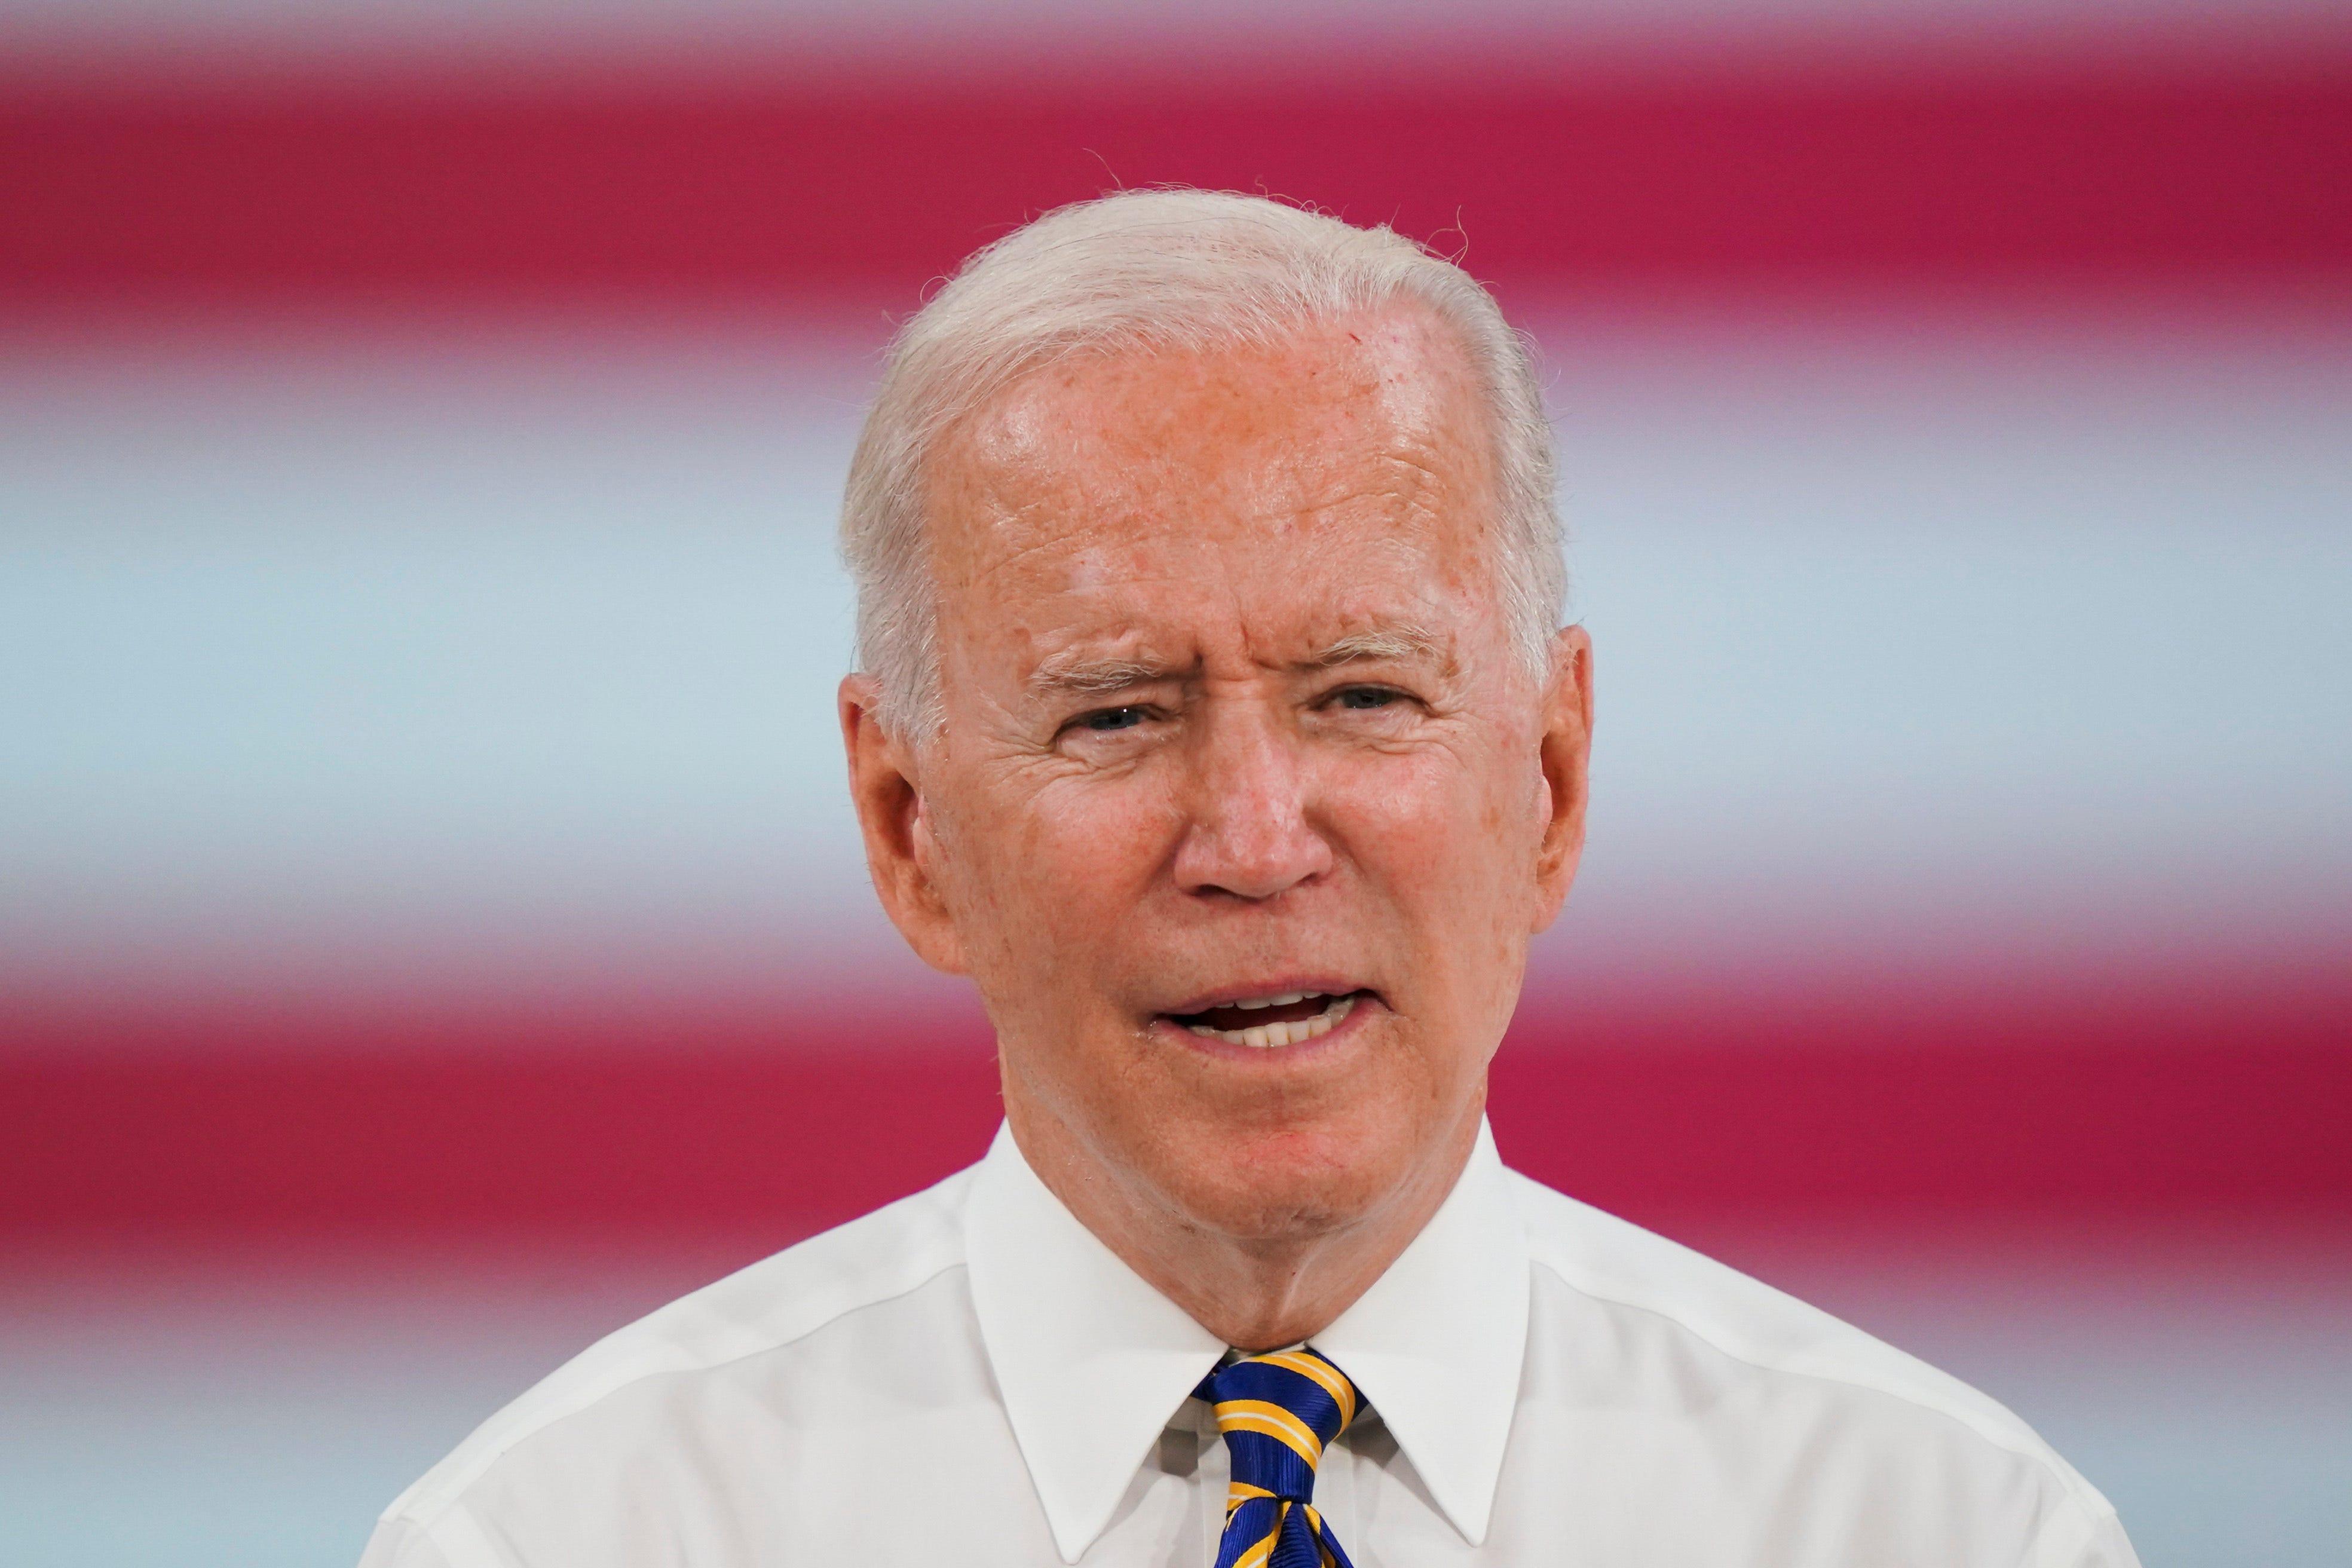 Biden to allow eviction moratorium to expire Saturday 1